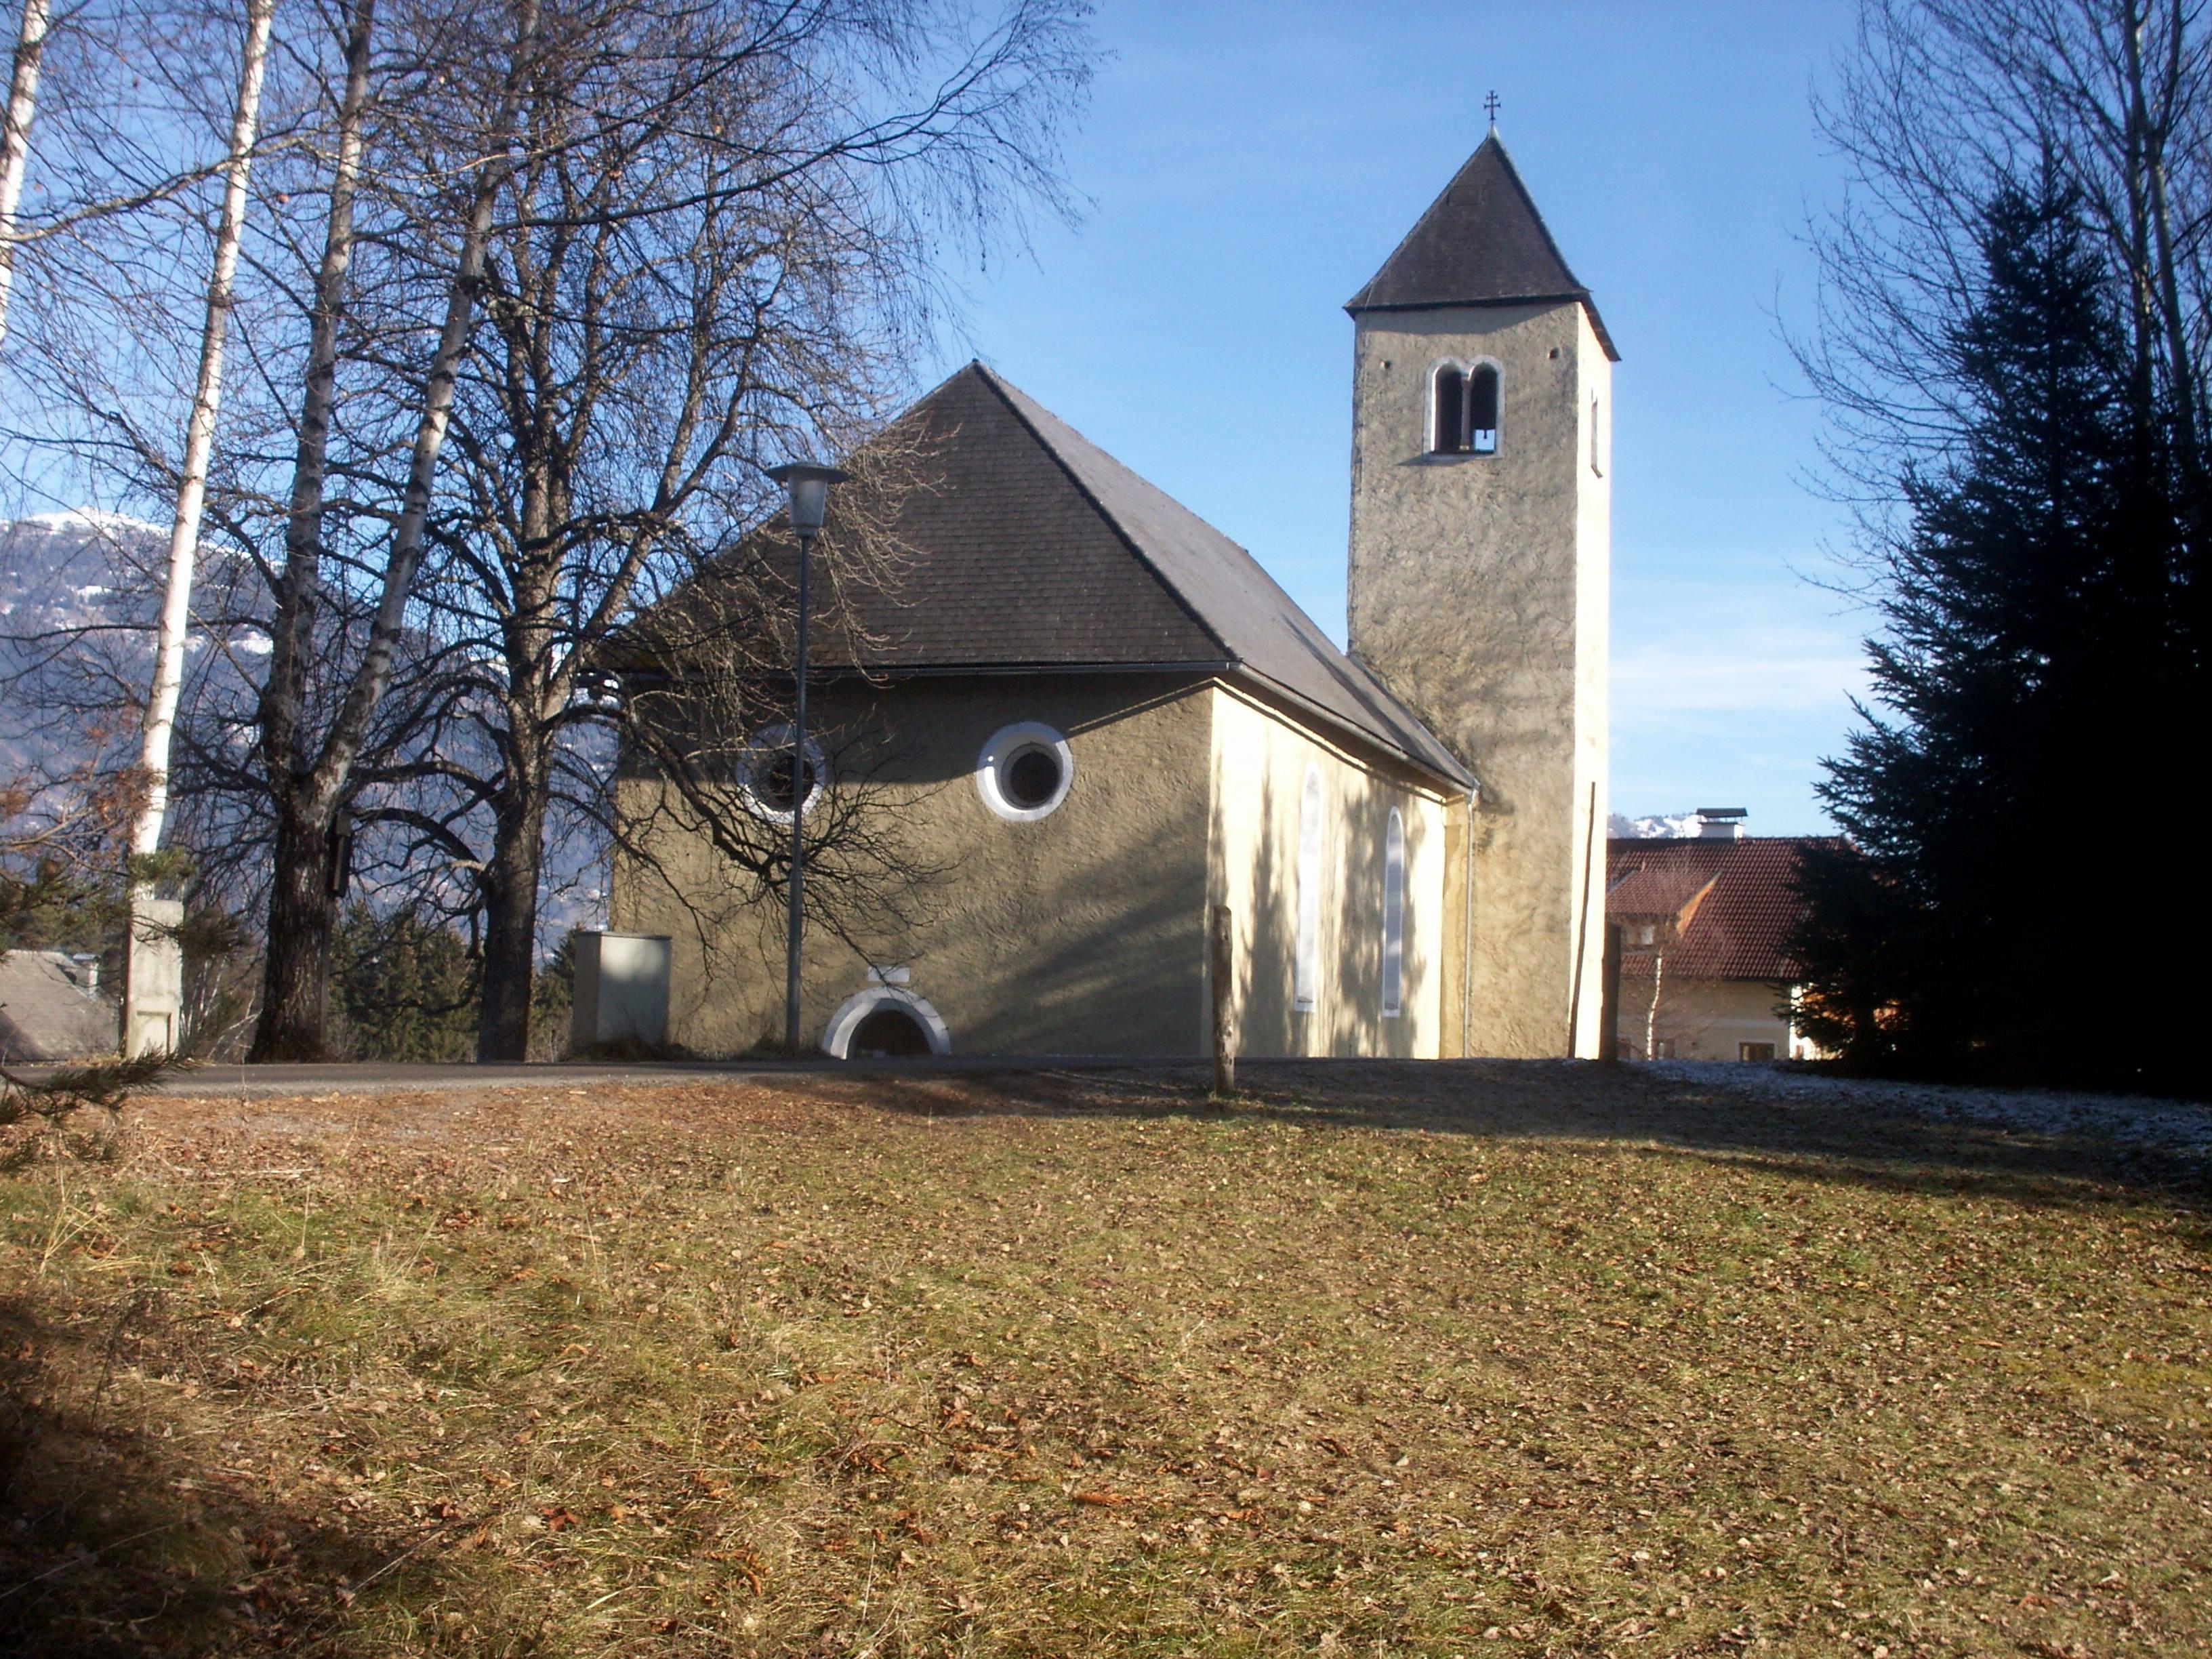 seeboden in Krnten - Thema auf carolinavolksfolks.com